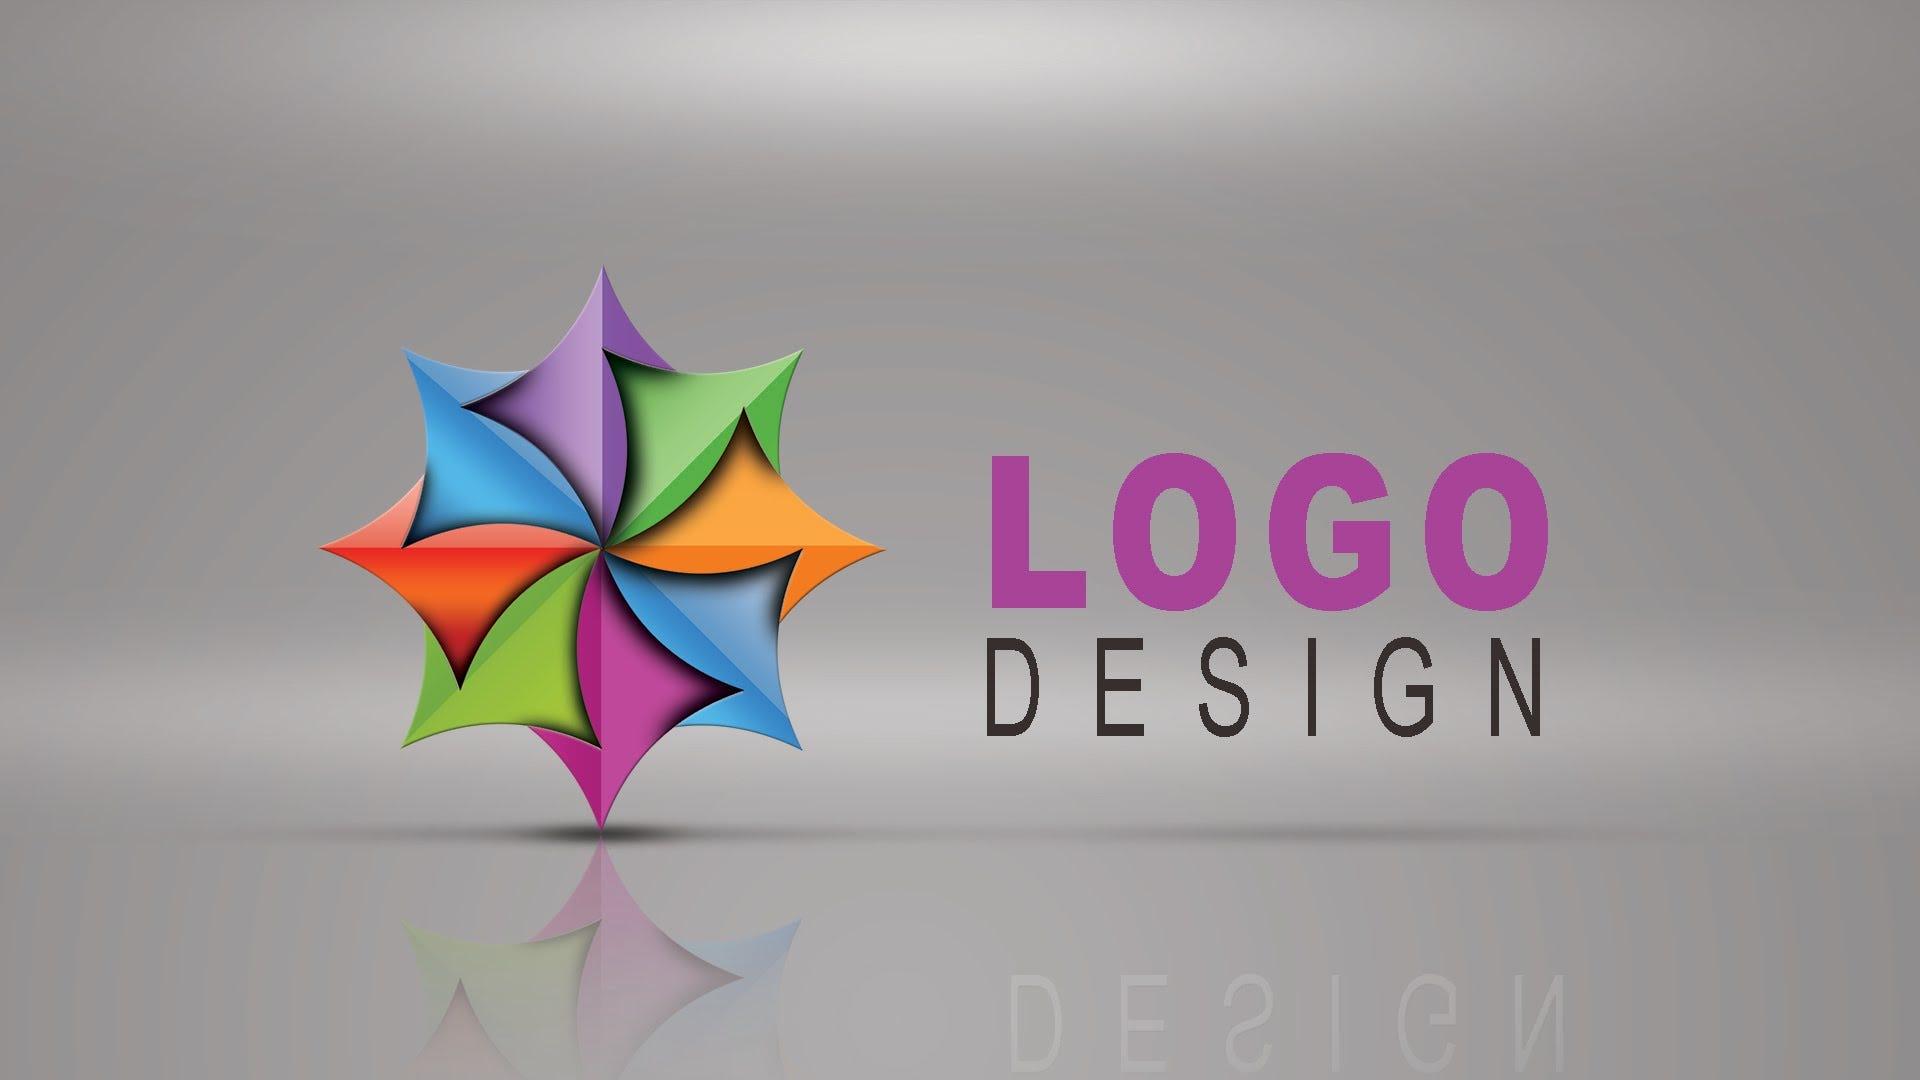 10 Best Logo Design Tutorials & Courses Online — 2019